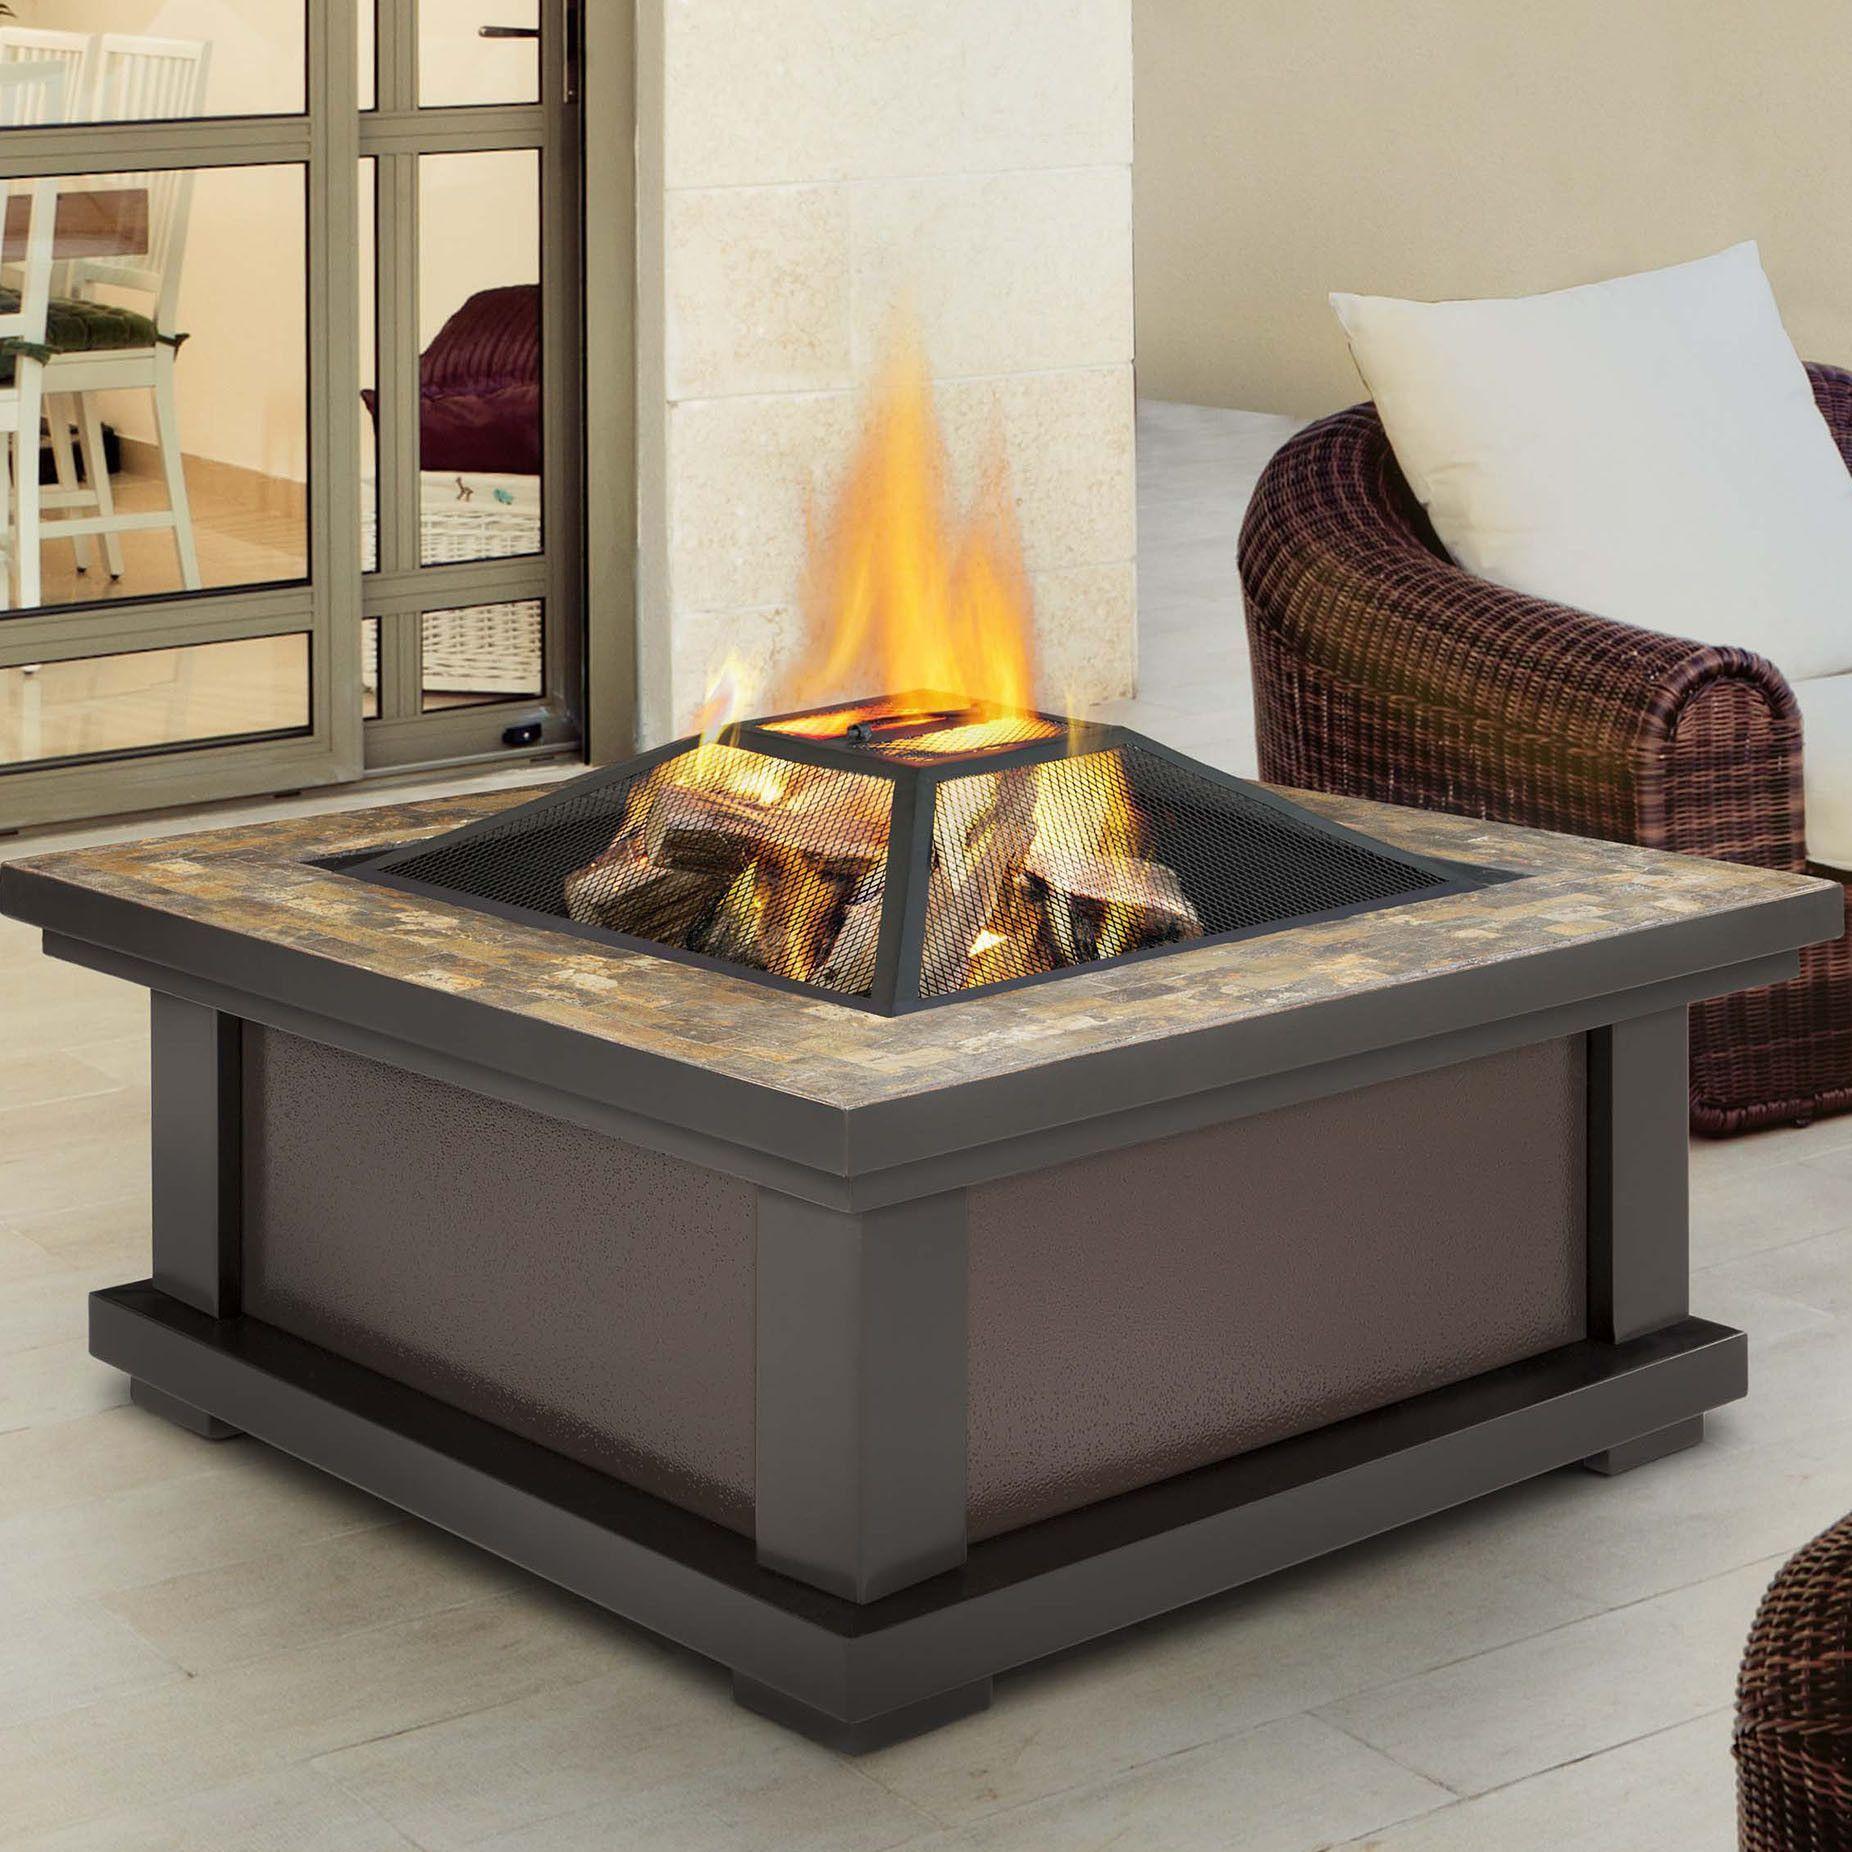 alderwood steel wood burning fire pit table products fire pit rh pinterest com au